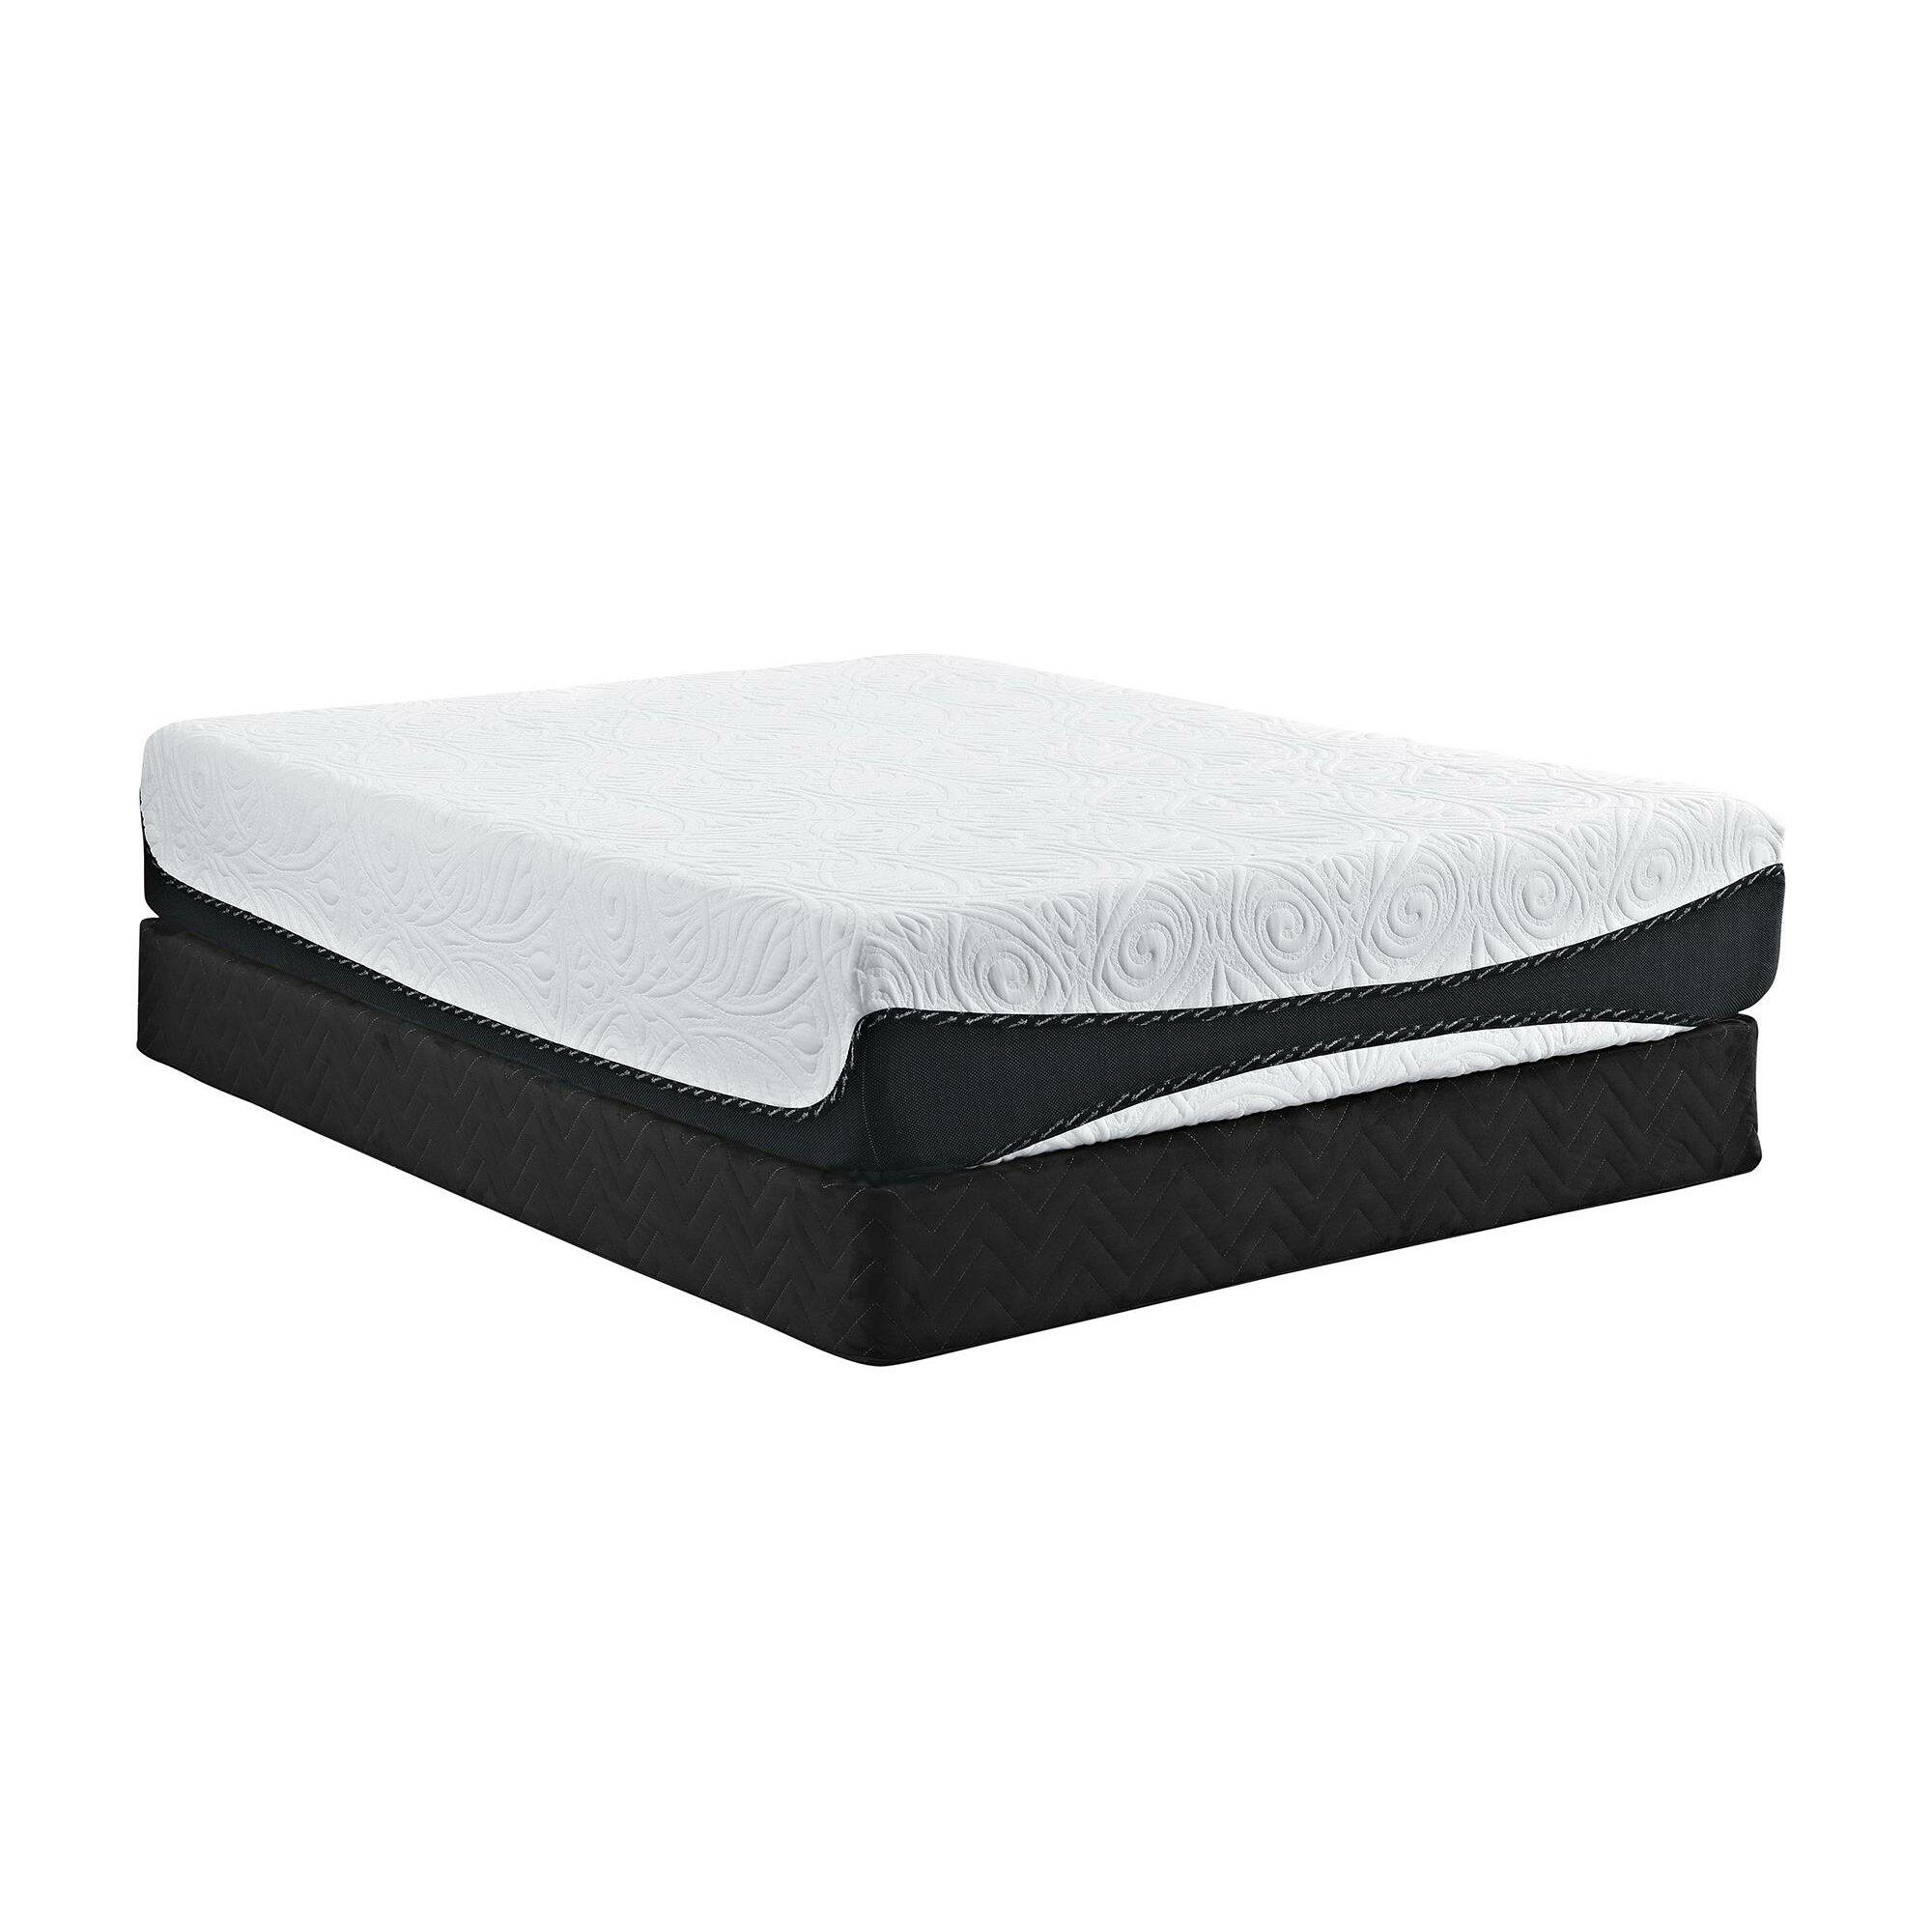 Dhp Signature Sleep 12 Quot Gel Memory Foam Mattress Amp Reviews